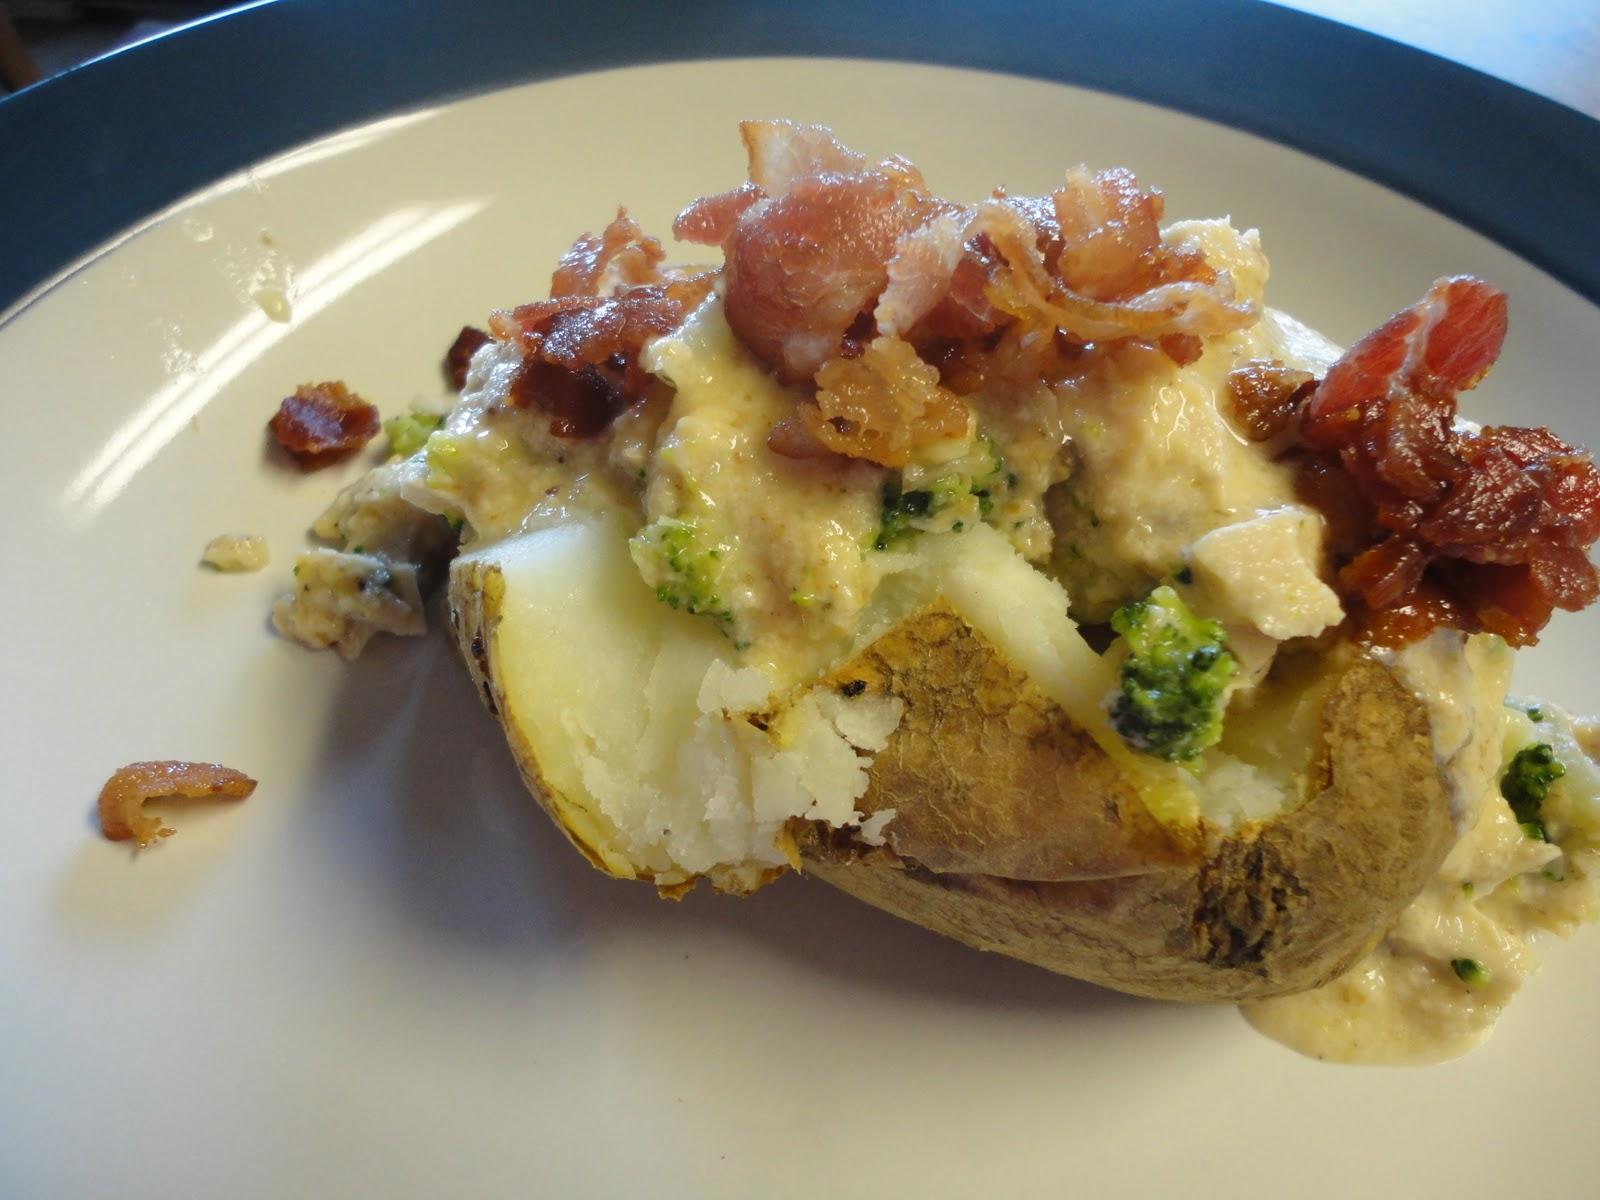 The Frickin Chicken: Cheesy Chicken and Broccoli Stuffed ...